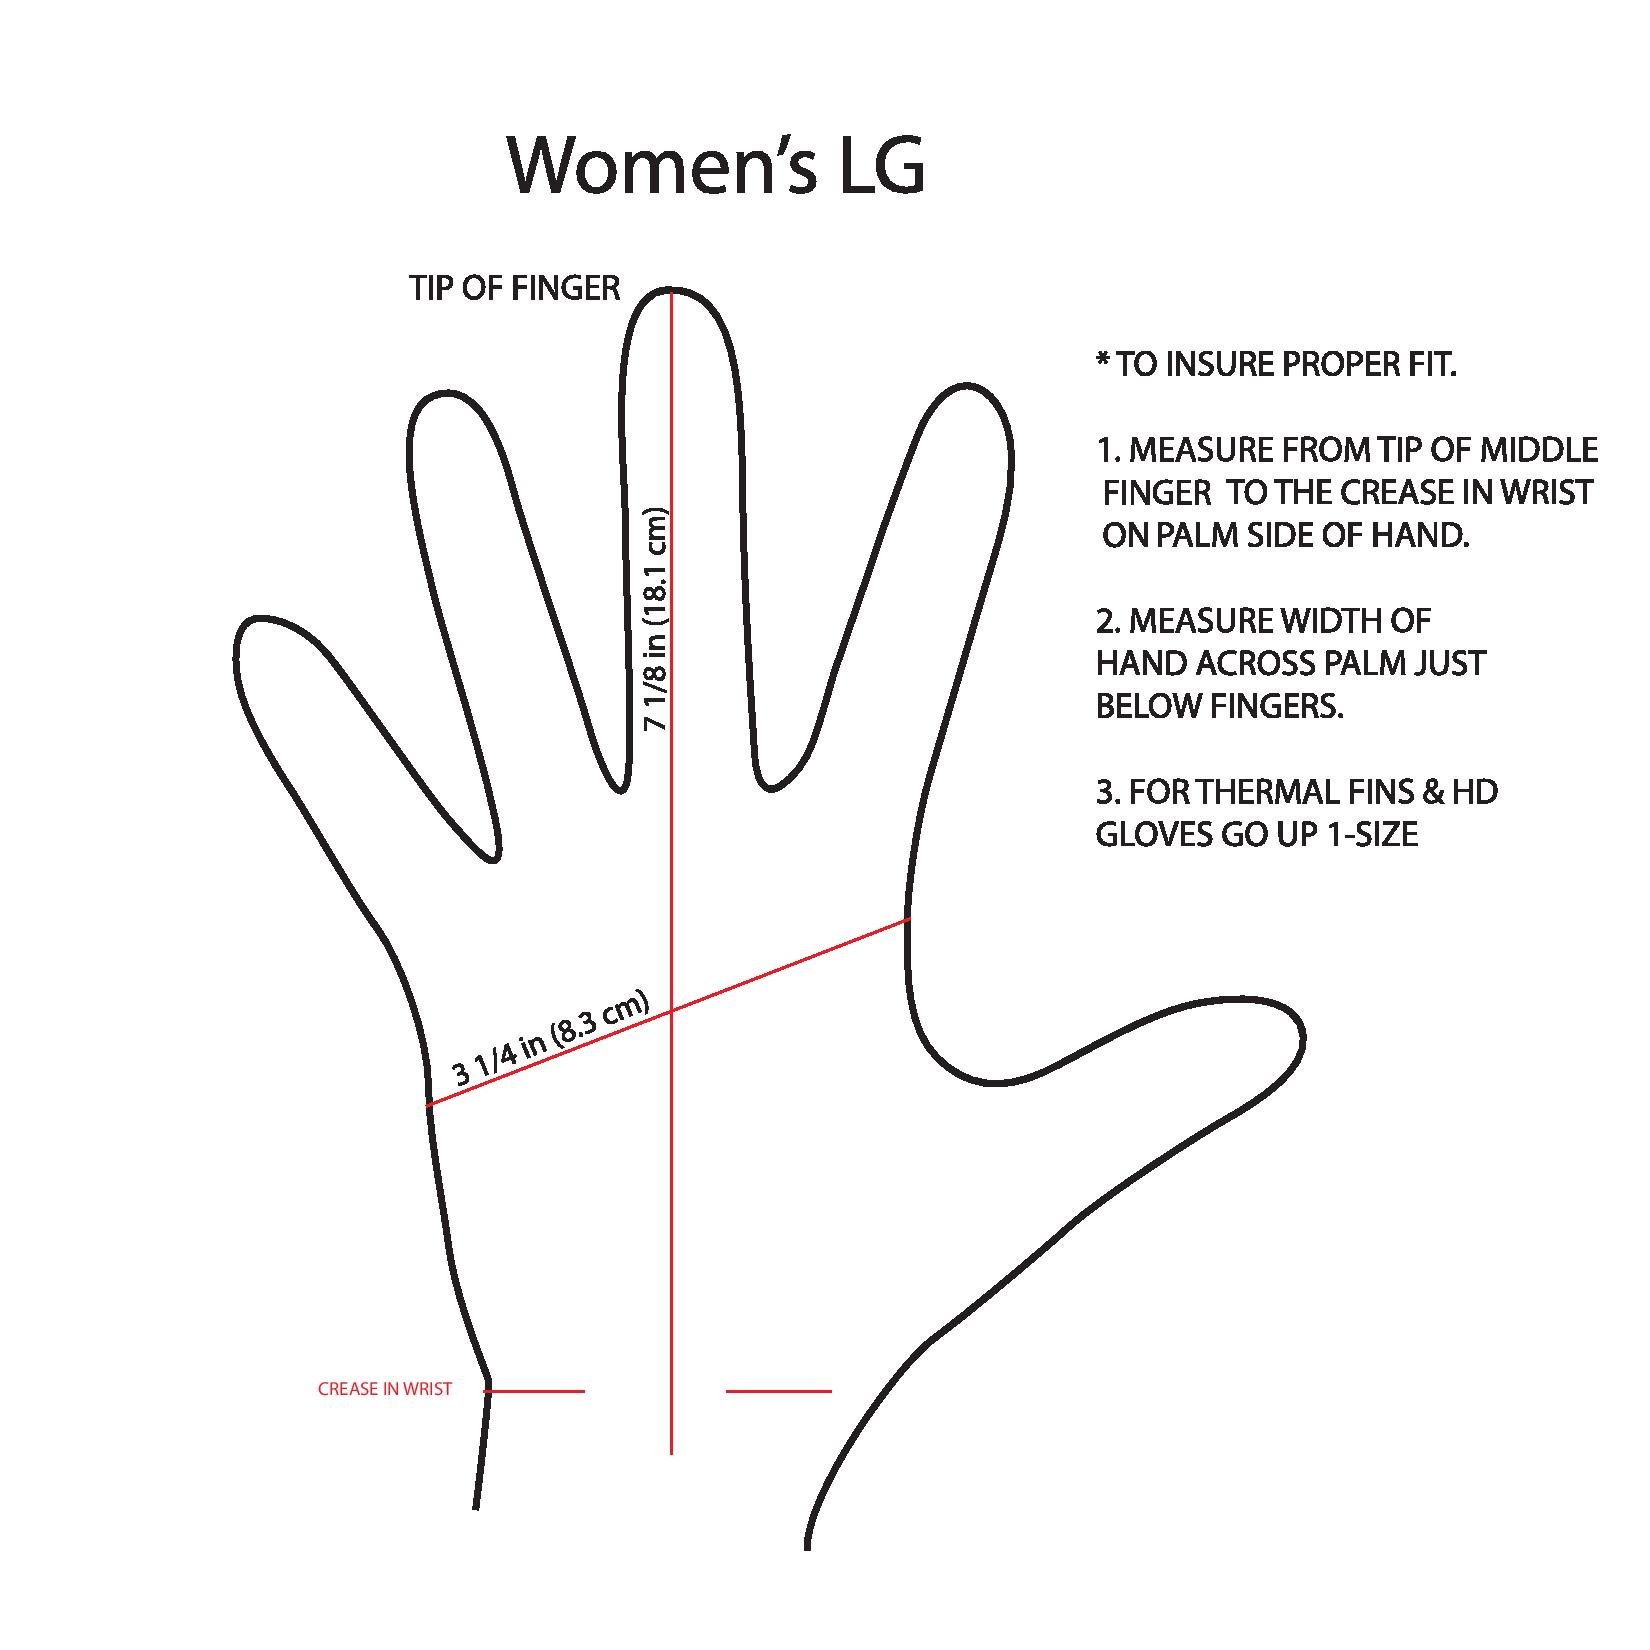 women-s-lg-page-001-2-.jpg